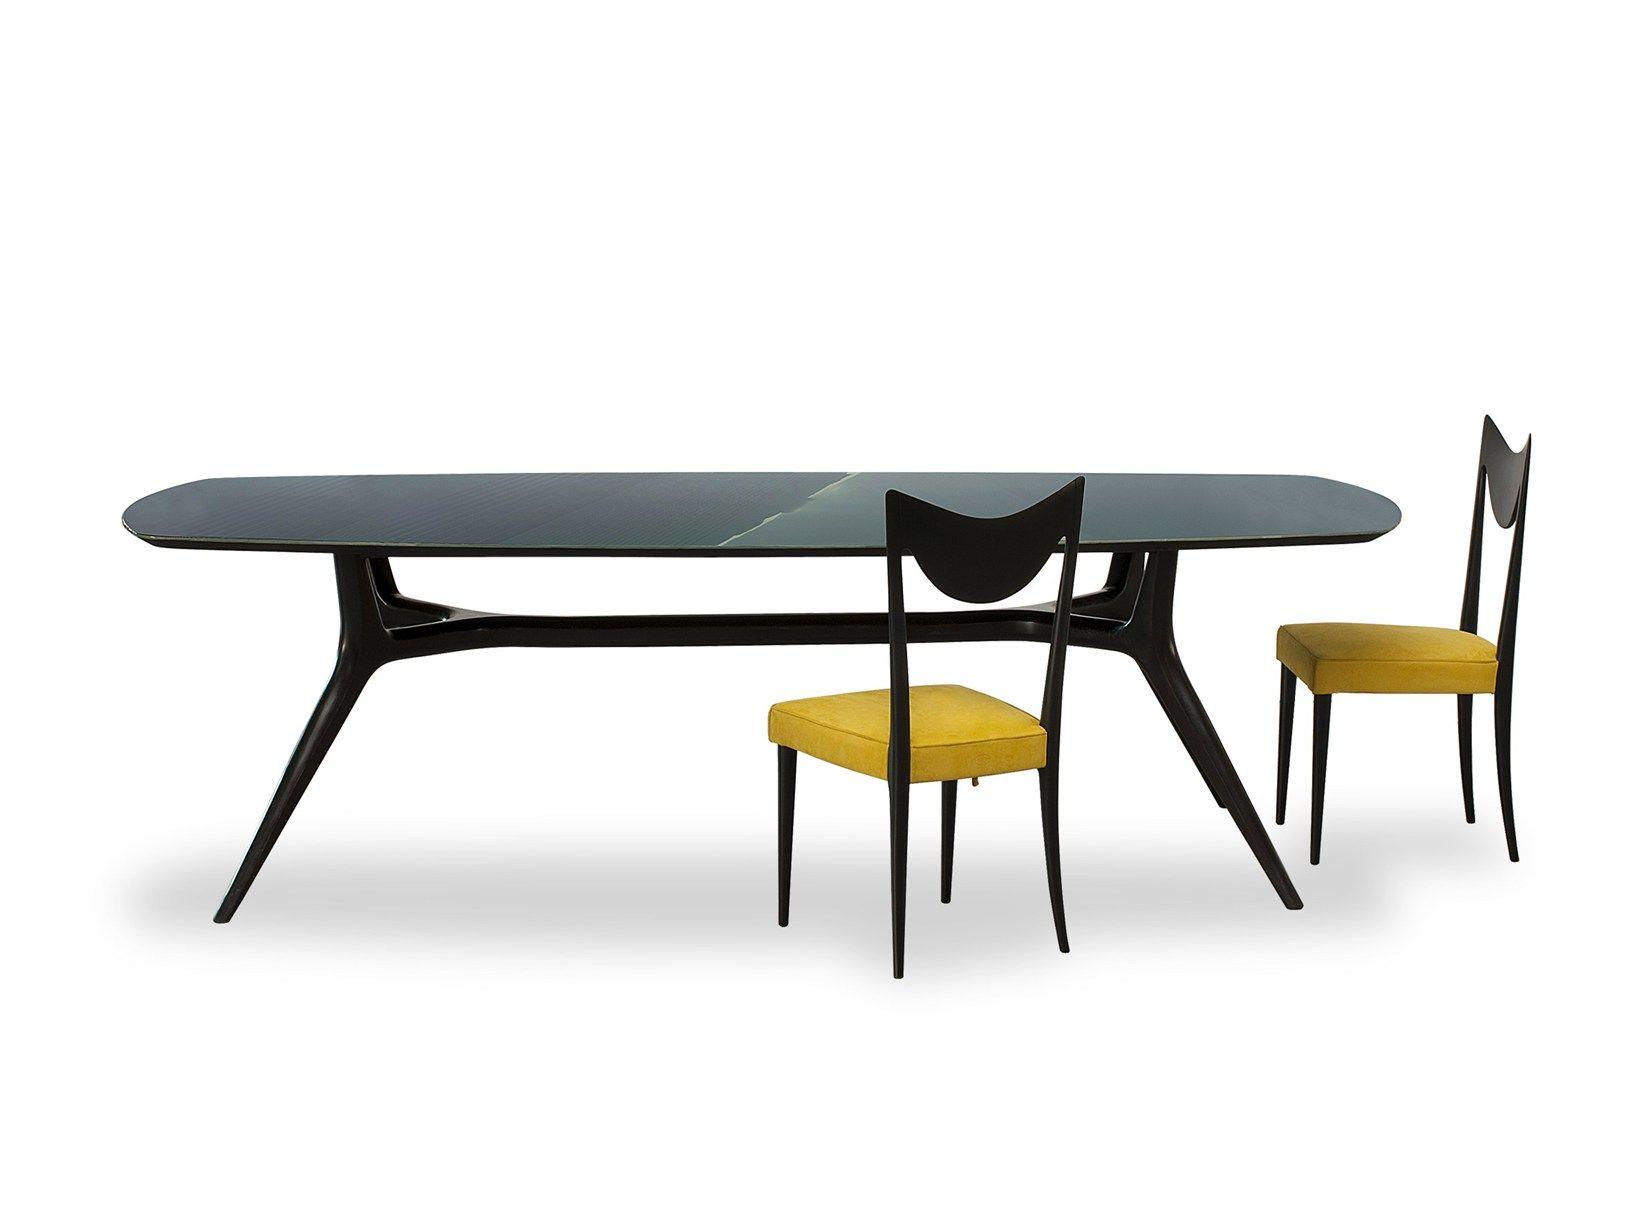 baxter si ispira agli anni 39 50. Black Bedroom Furniture Sets. Home Design Ideas